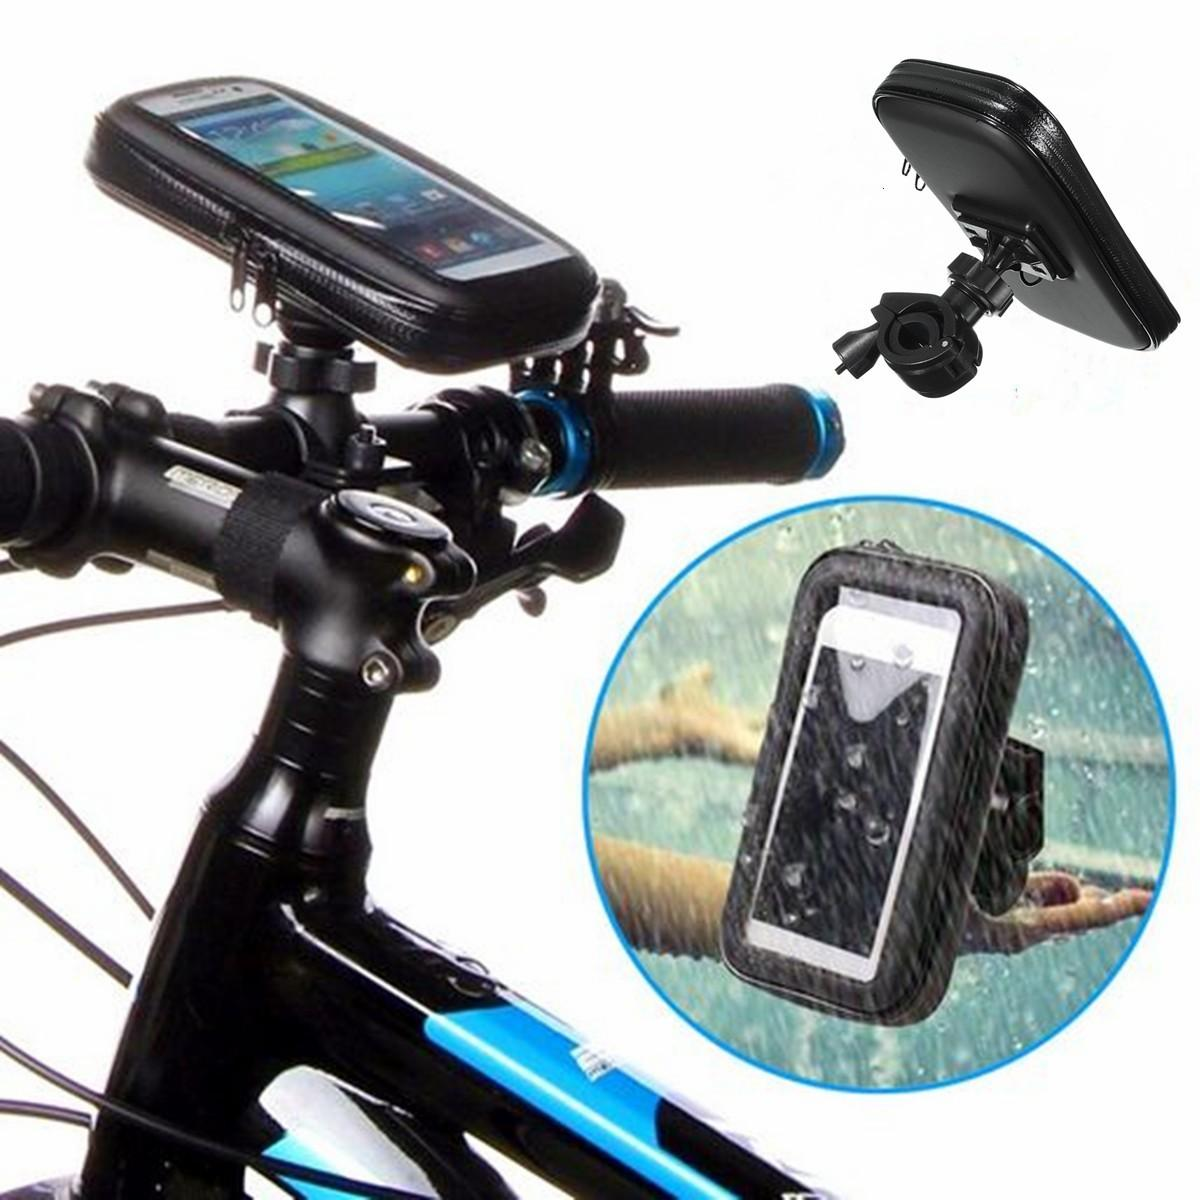 Bicycle Phone Mount >> Universal Waterproof Motor Bike Motorcycle Case Bike Bag Phone Mount Holder For Iphone Samsung Gps